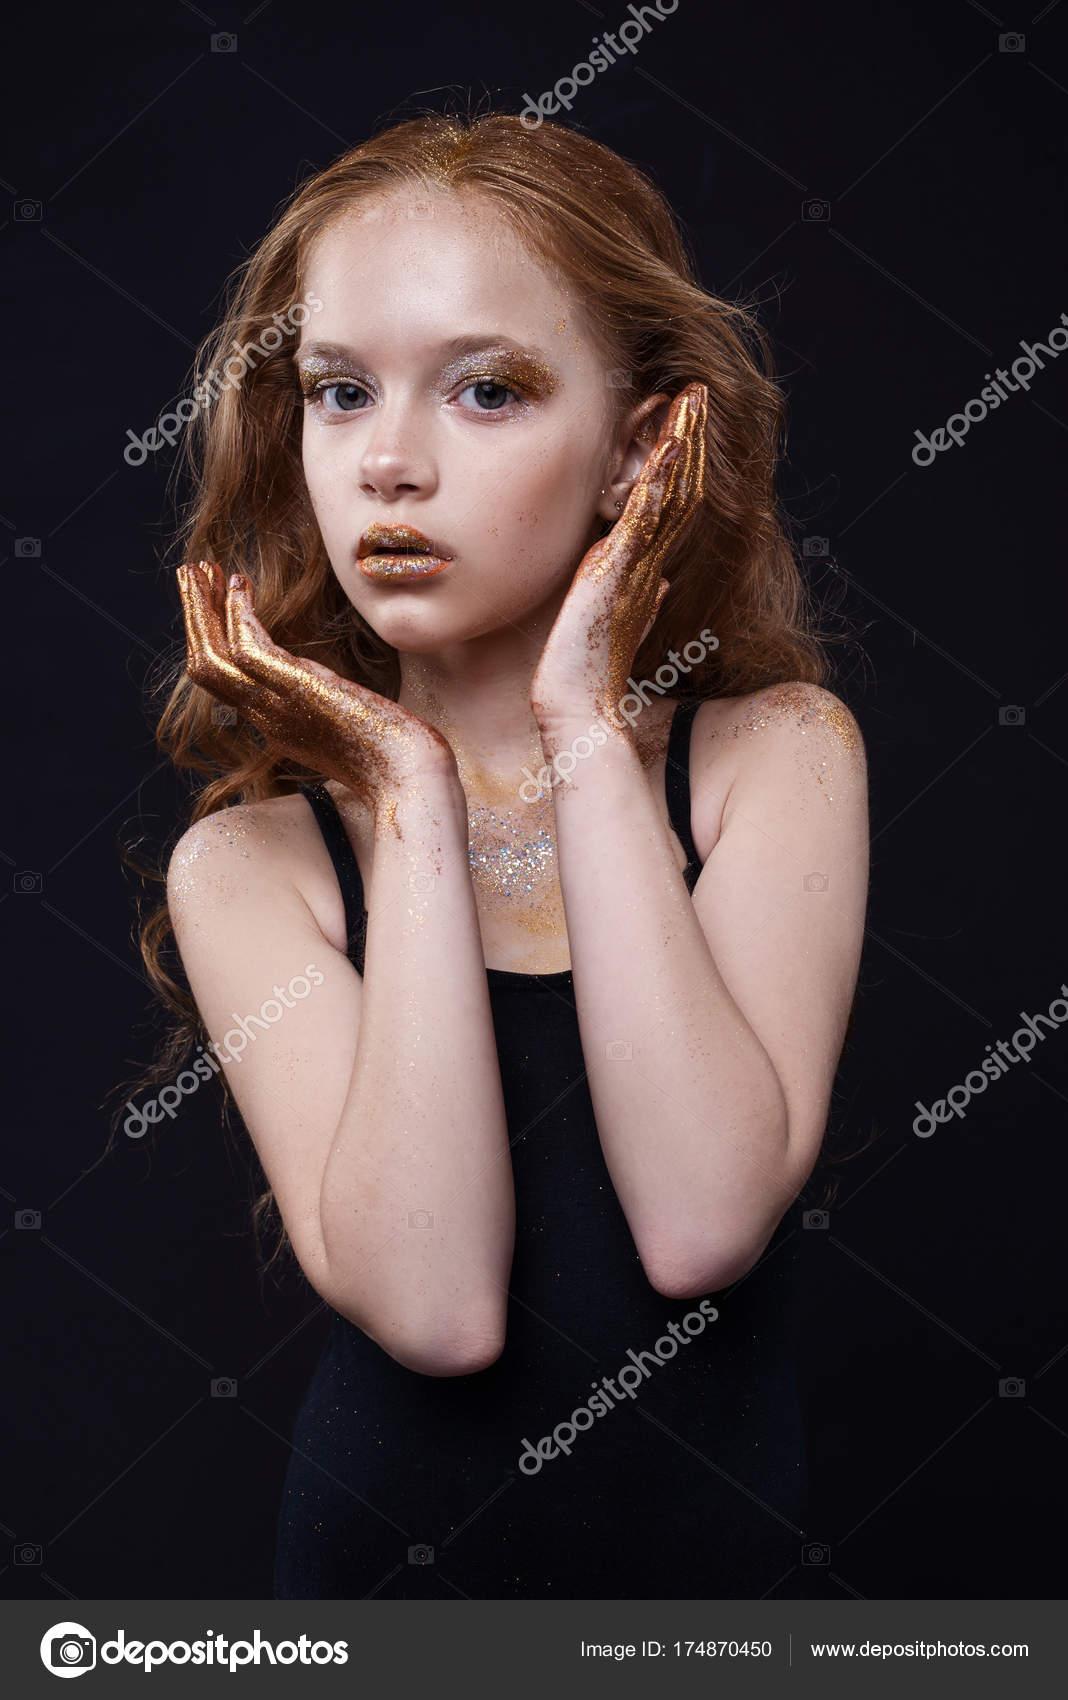 adolescente rossa